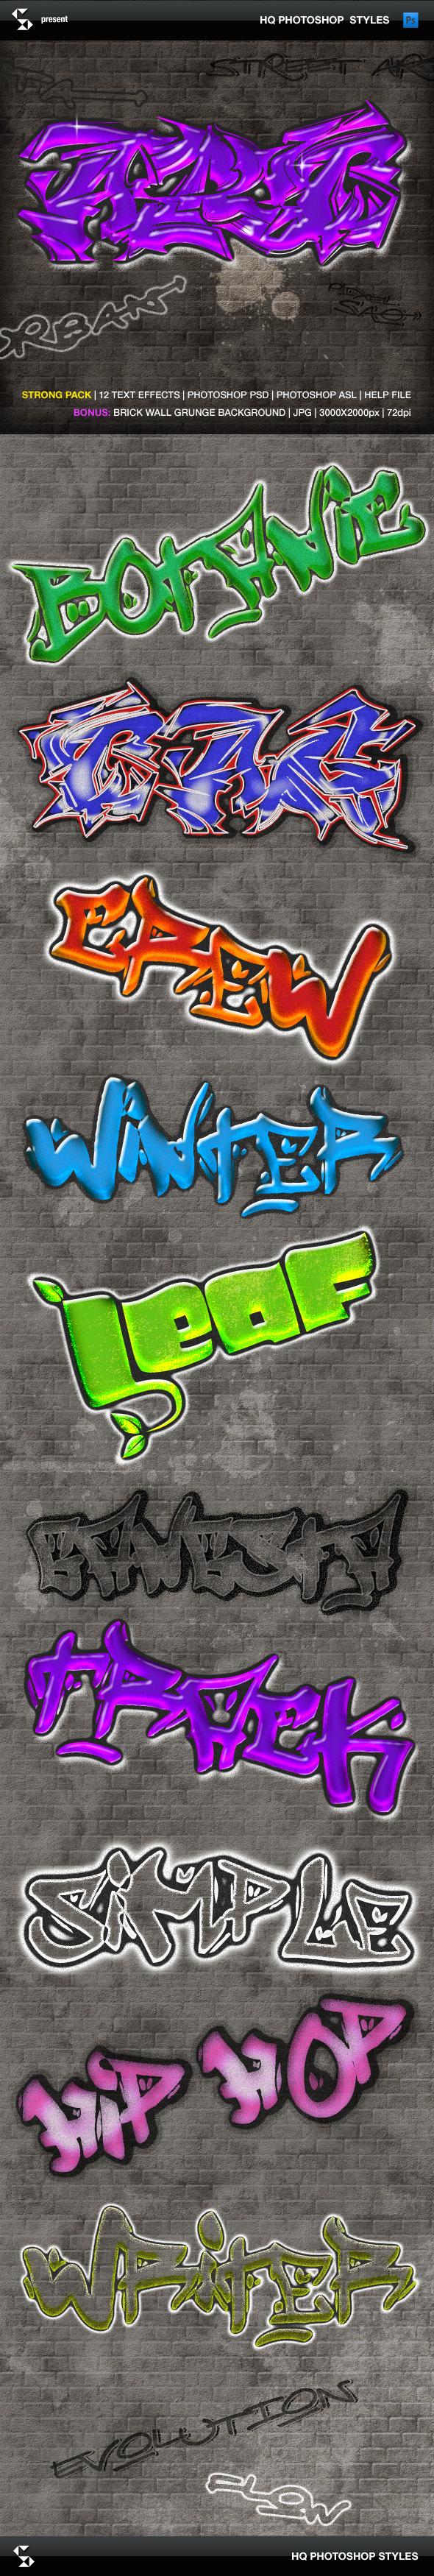 Urban Graffiti Text Effects - Text Effects Styles